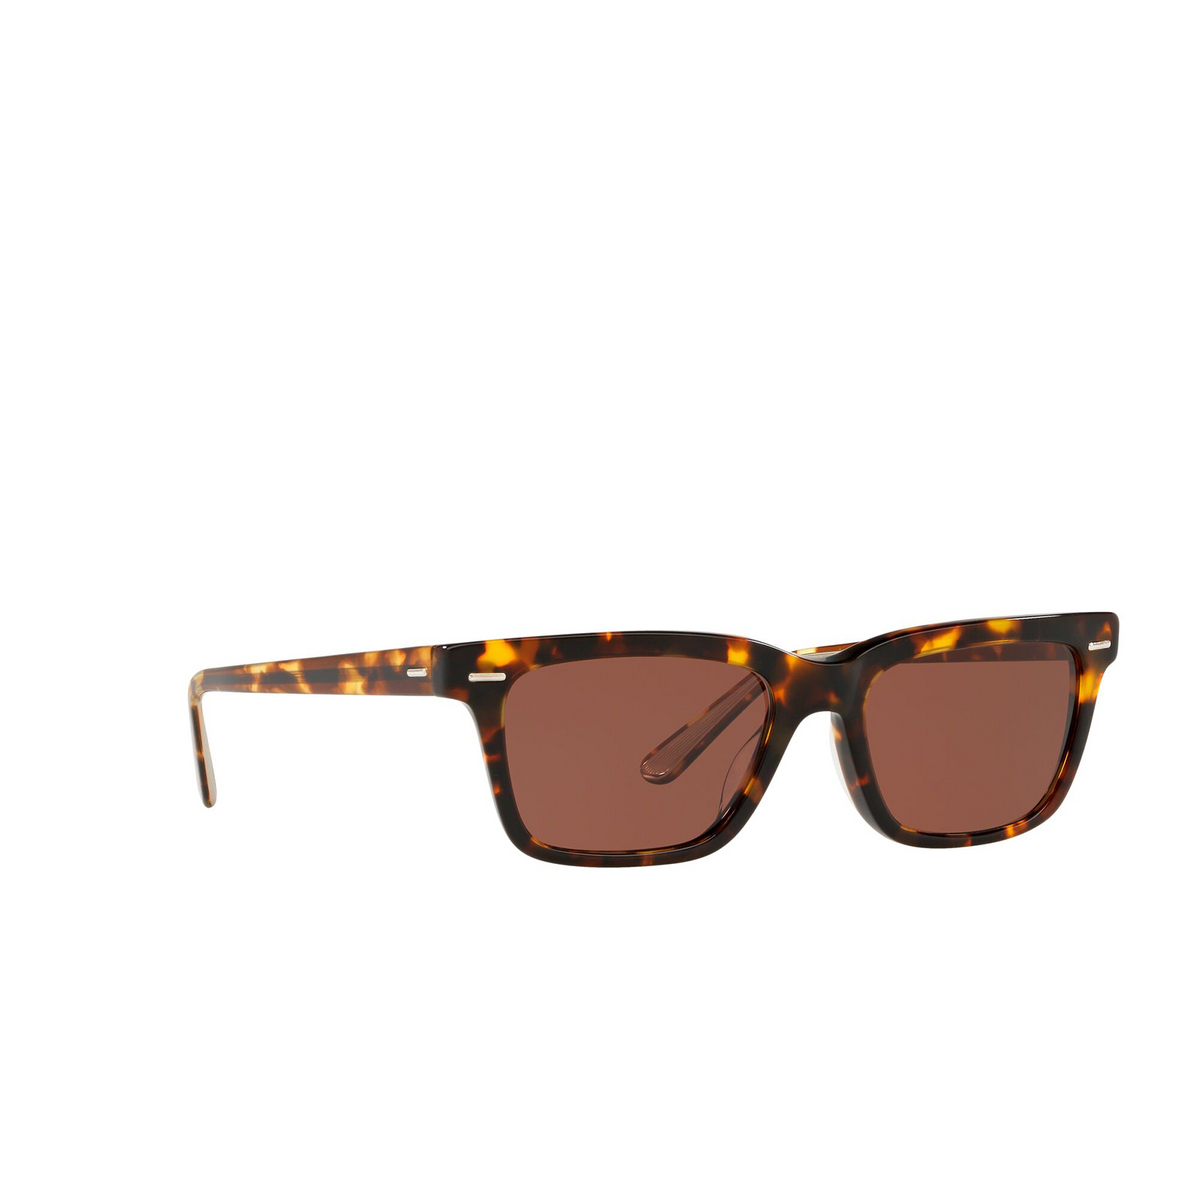 Oliver Peoples® Square Sunglasses: Ba Cc OV5388SU color Whiskey Tortoise 1663C5 - three-quarters view.